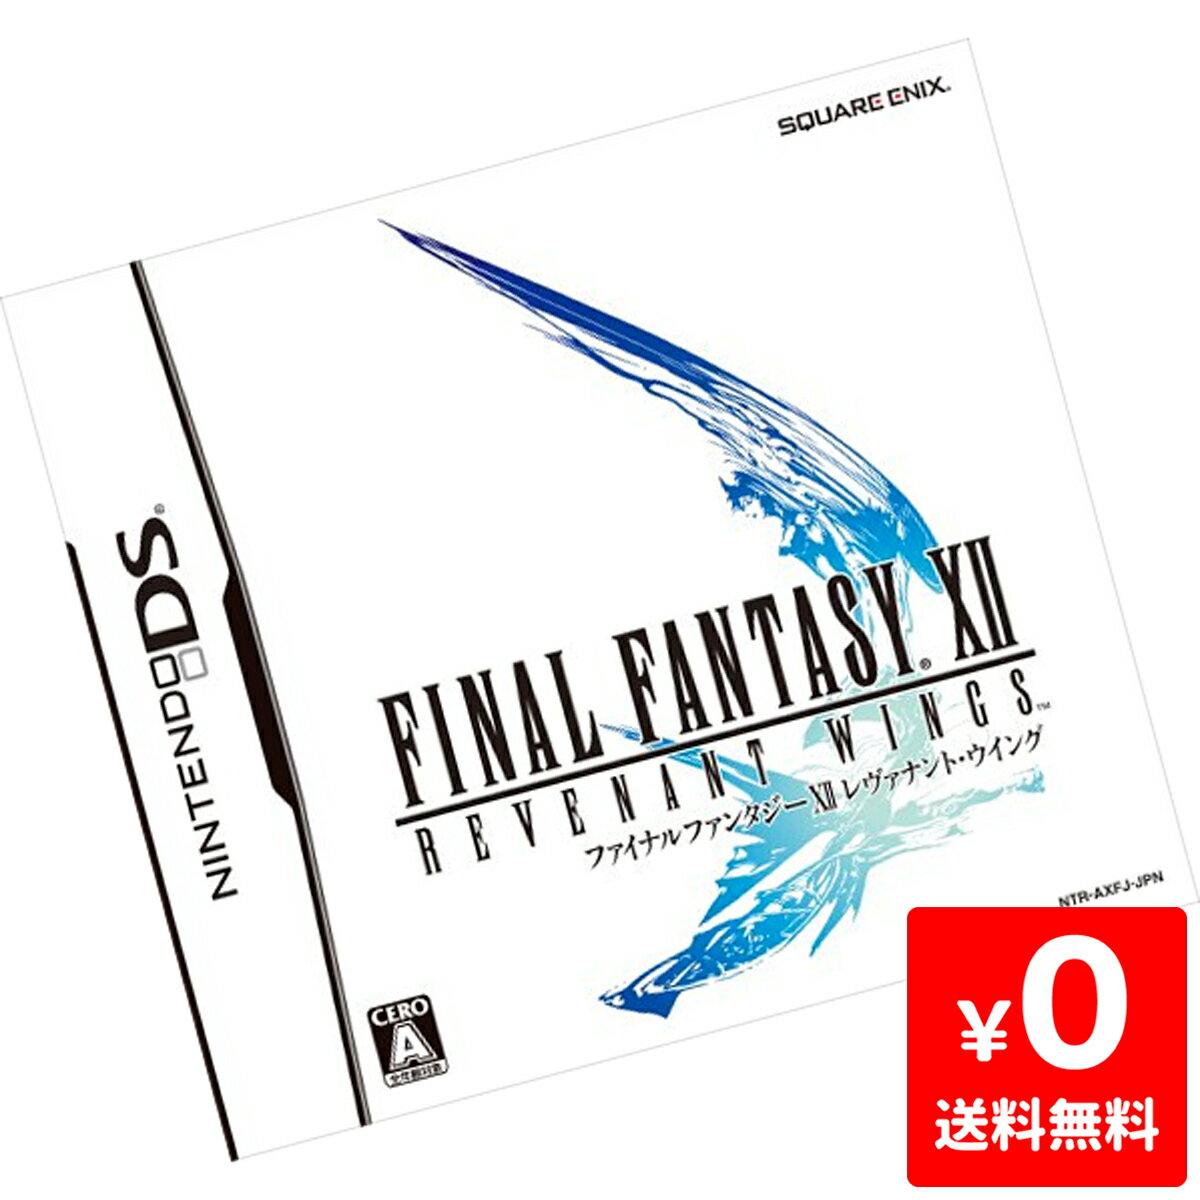 DS ファイナルファンタジーXII レヴァナント・ウイング FF7 ソフト ニンテンドー 任天堂 Nintendo 中古 4988601005098 送料無料 【中古】